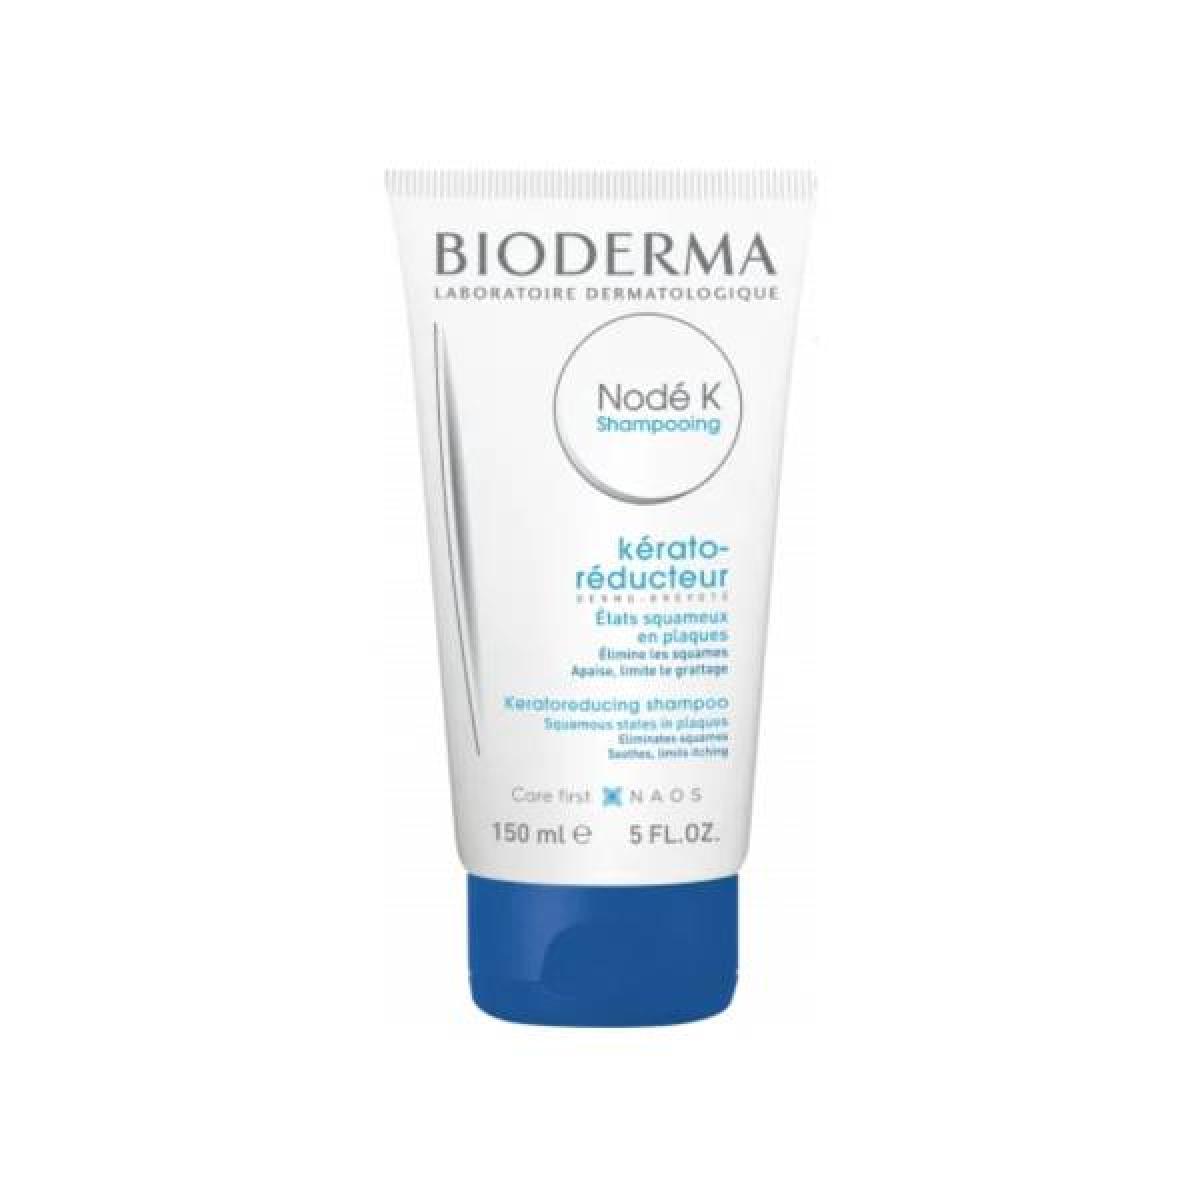 bioderma nod k shampooing 150ml parapharmacie pharmarket. Black Bedroom Furniture Sets. Home Design Ideas